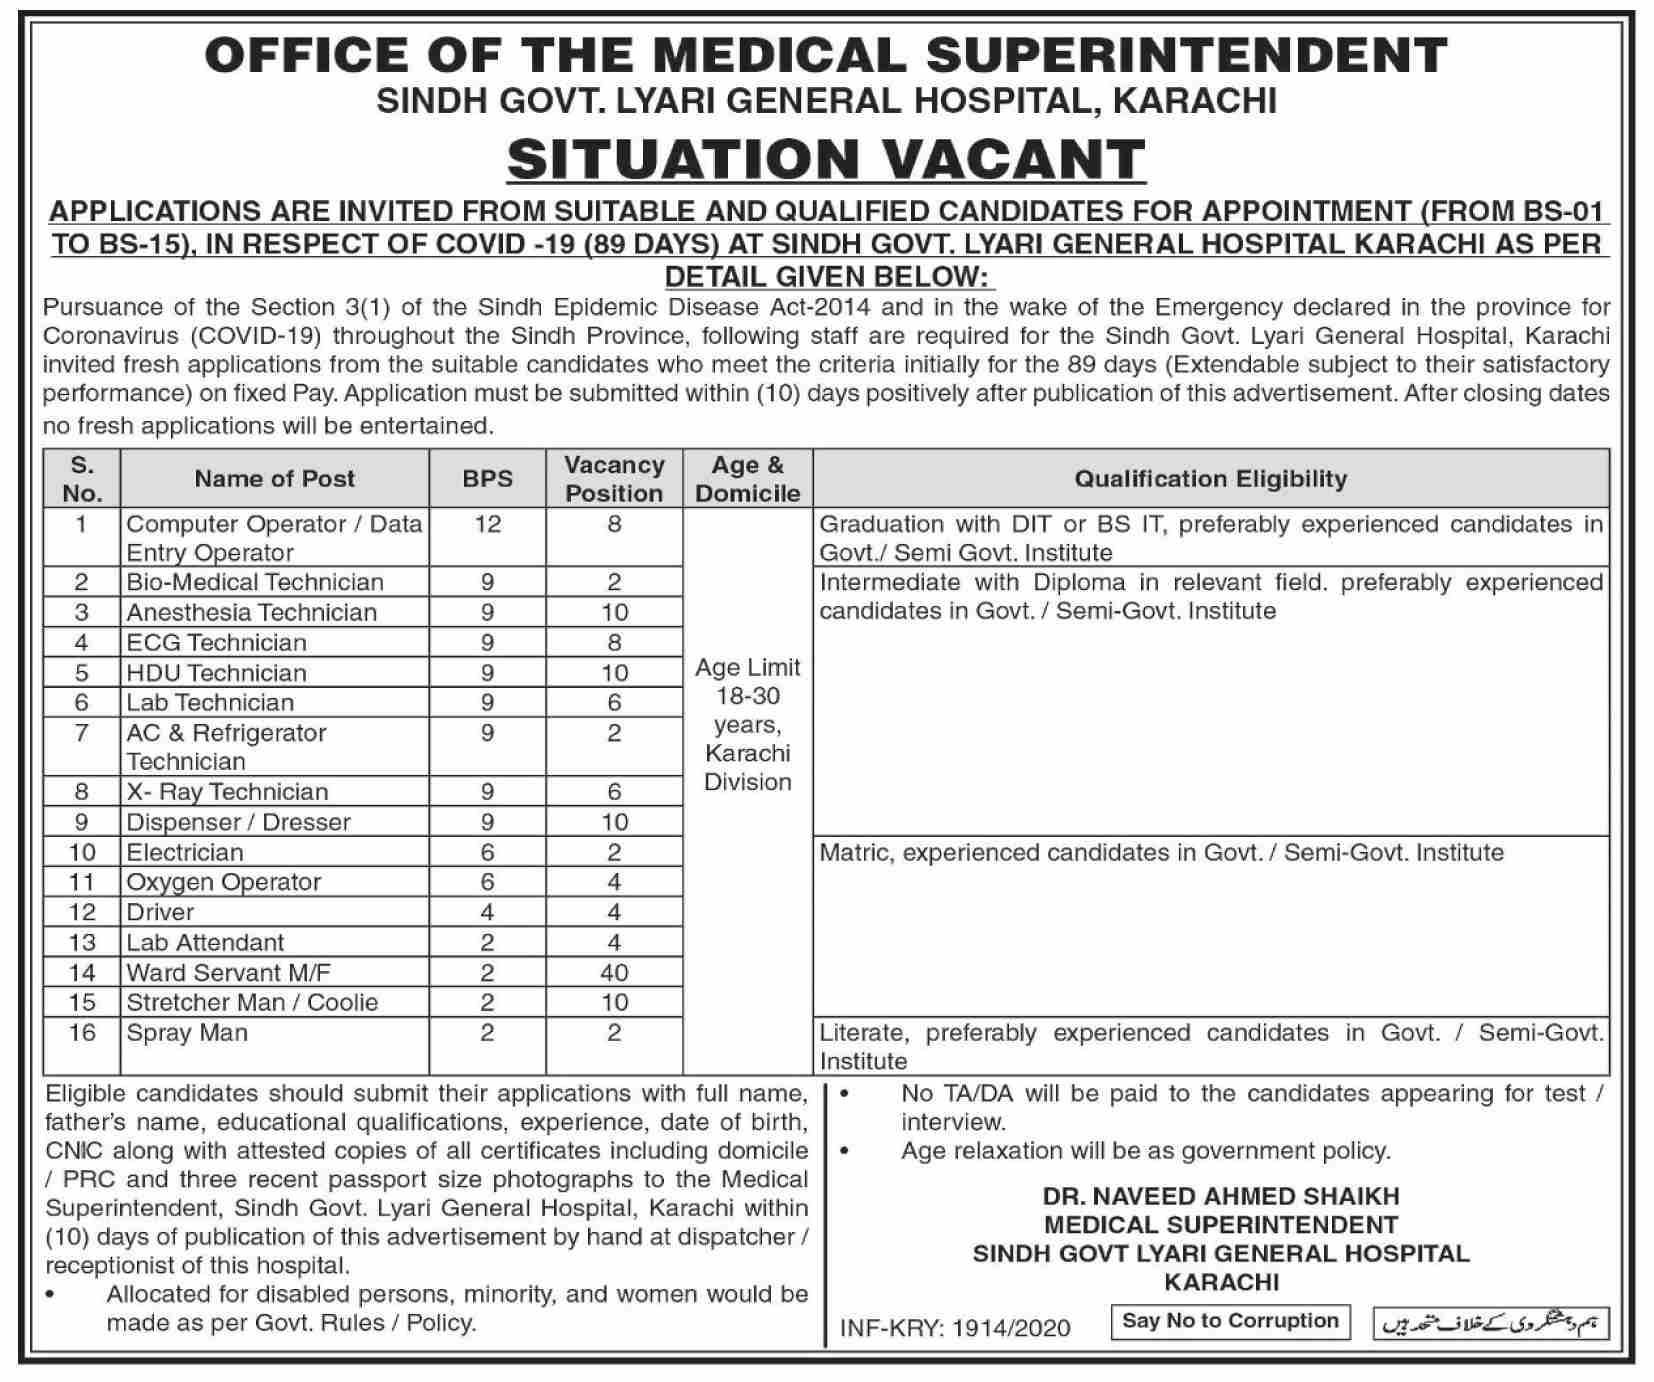 Oxygen Operator Lyari General Hospital Karachi Jobs August 04, 2020